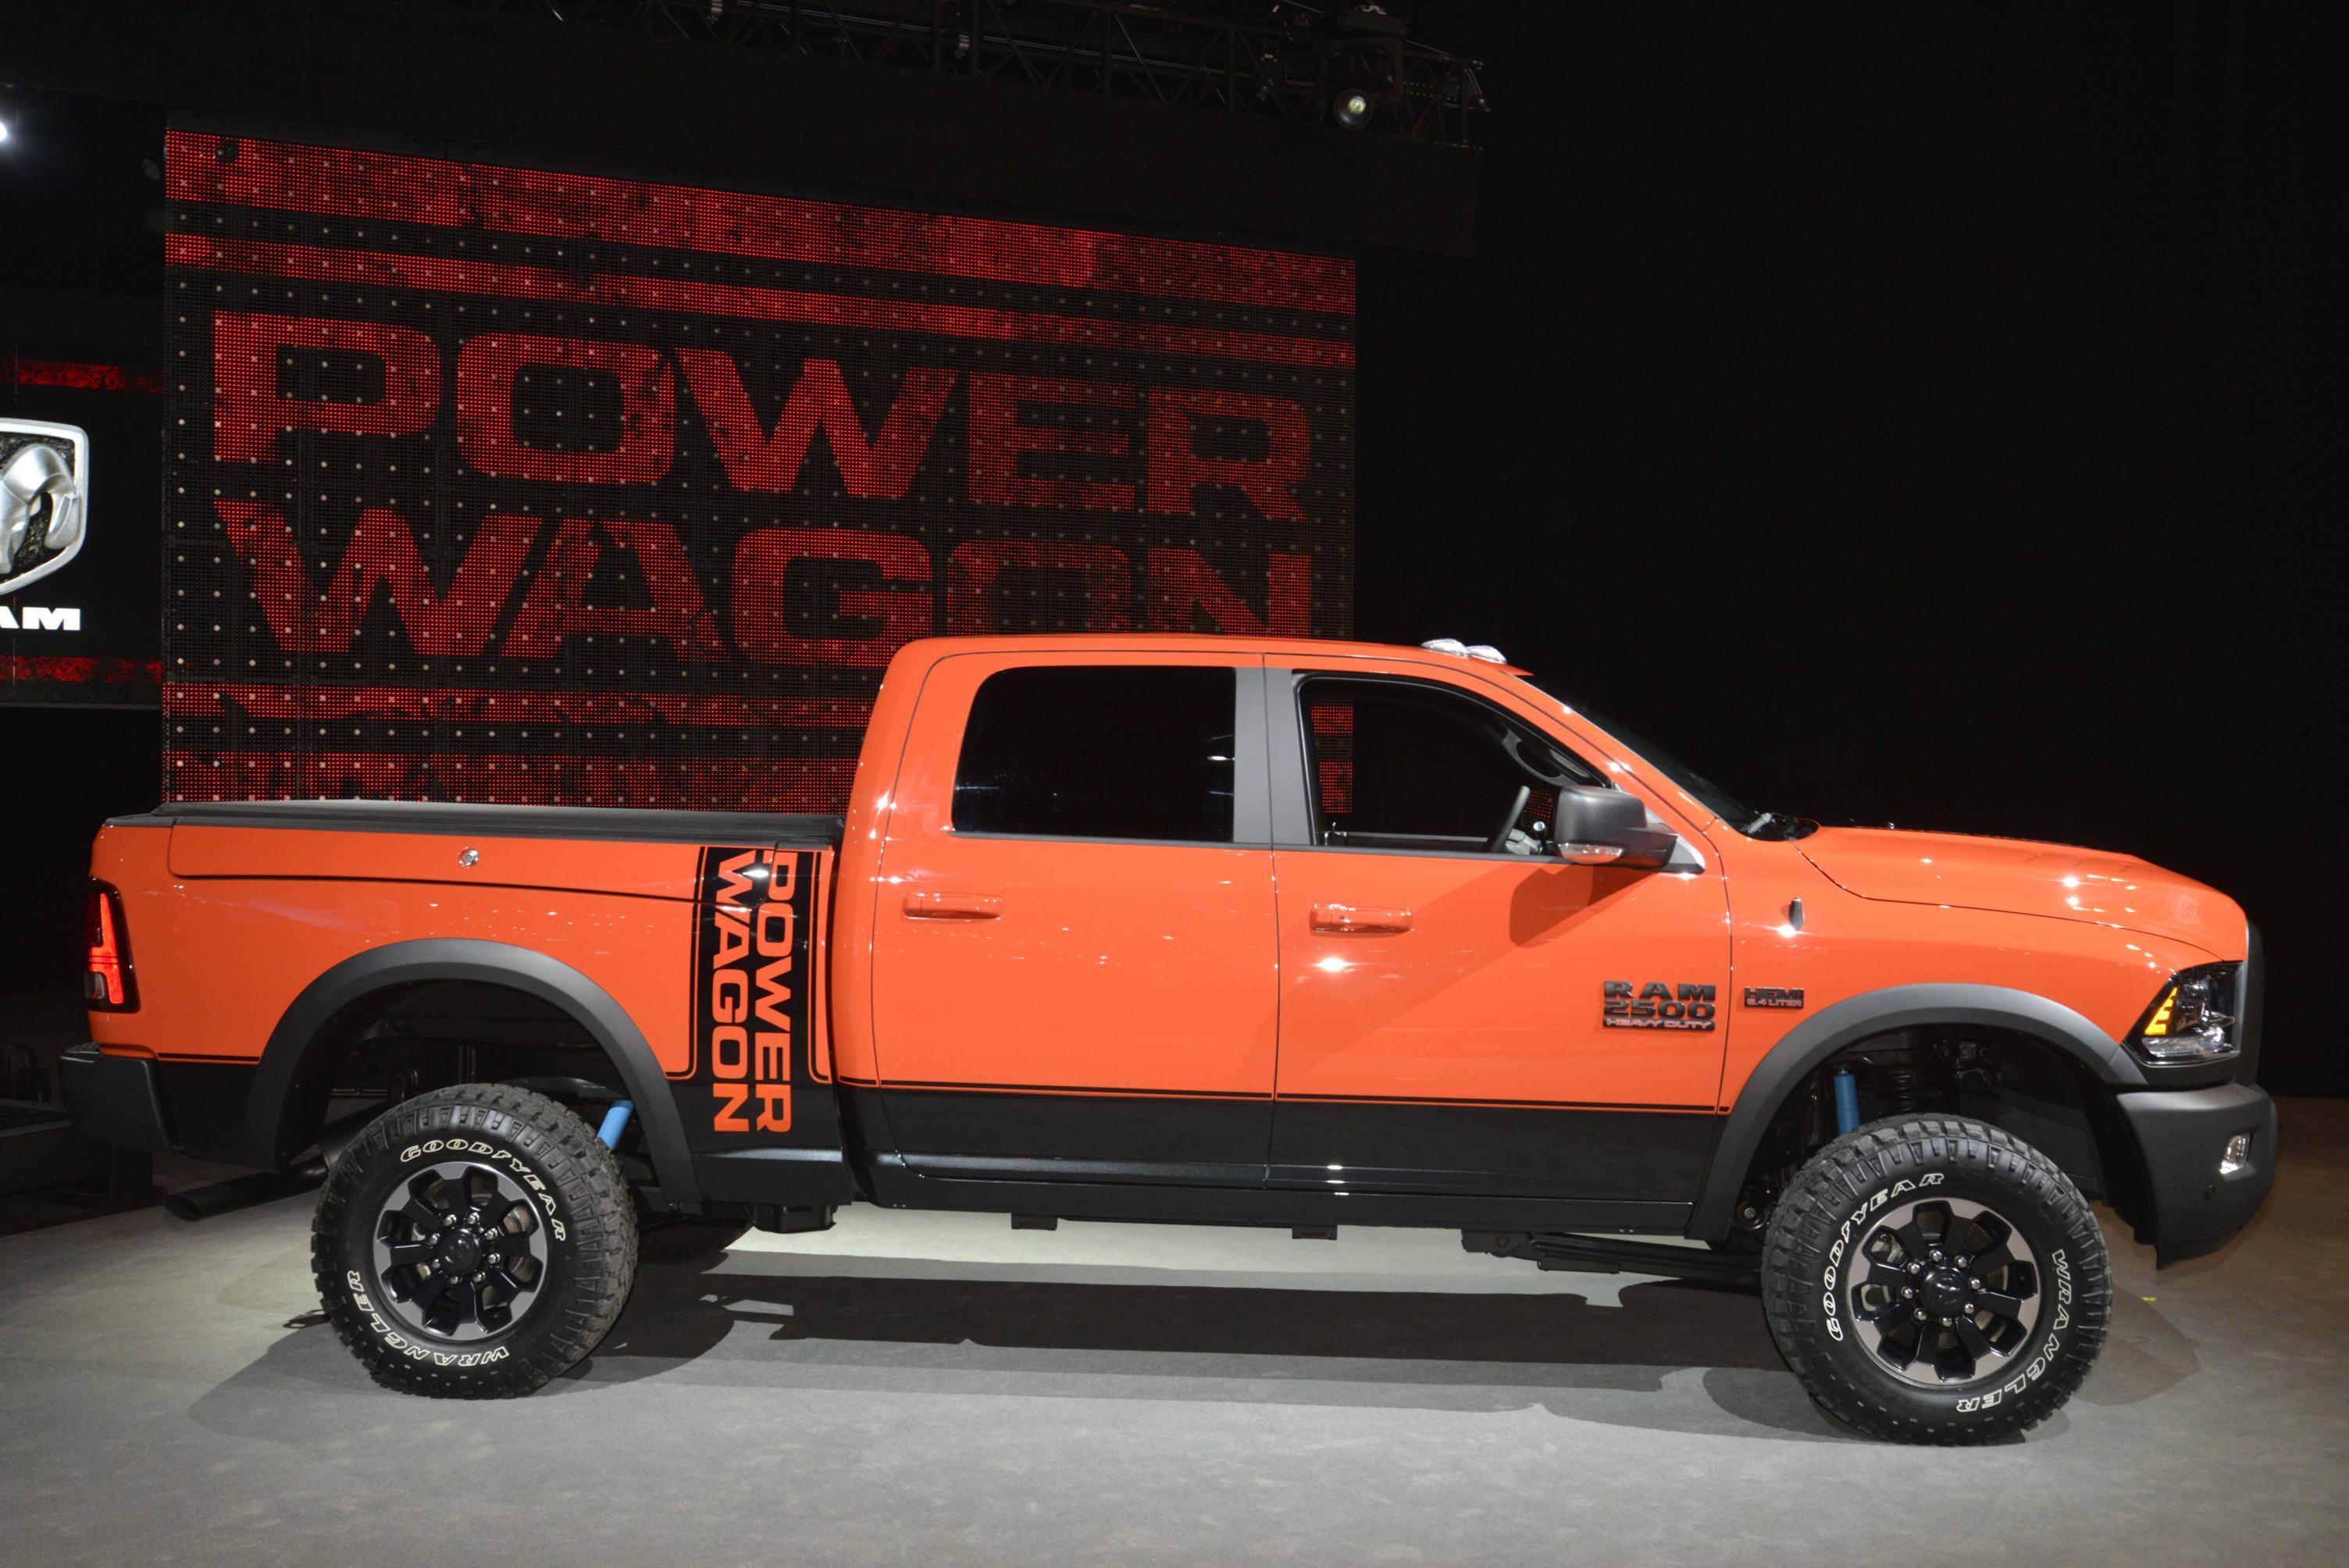 2017 Ram 2500 Power Wagon Demos Its Macho Suspension ...